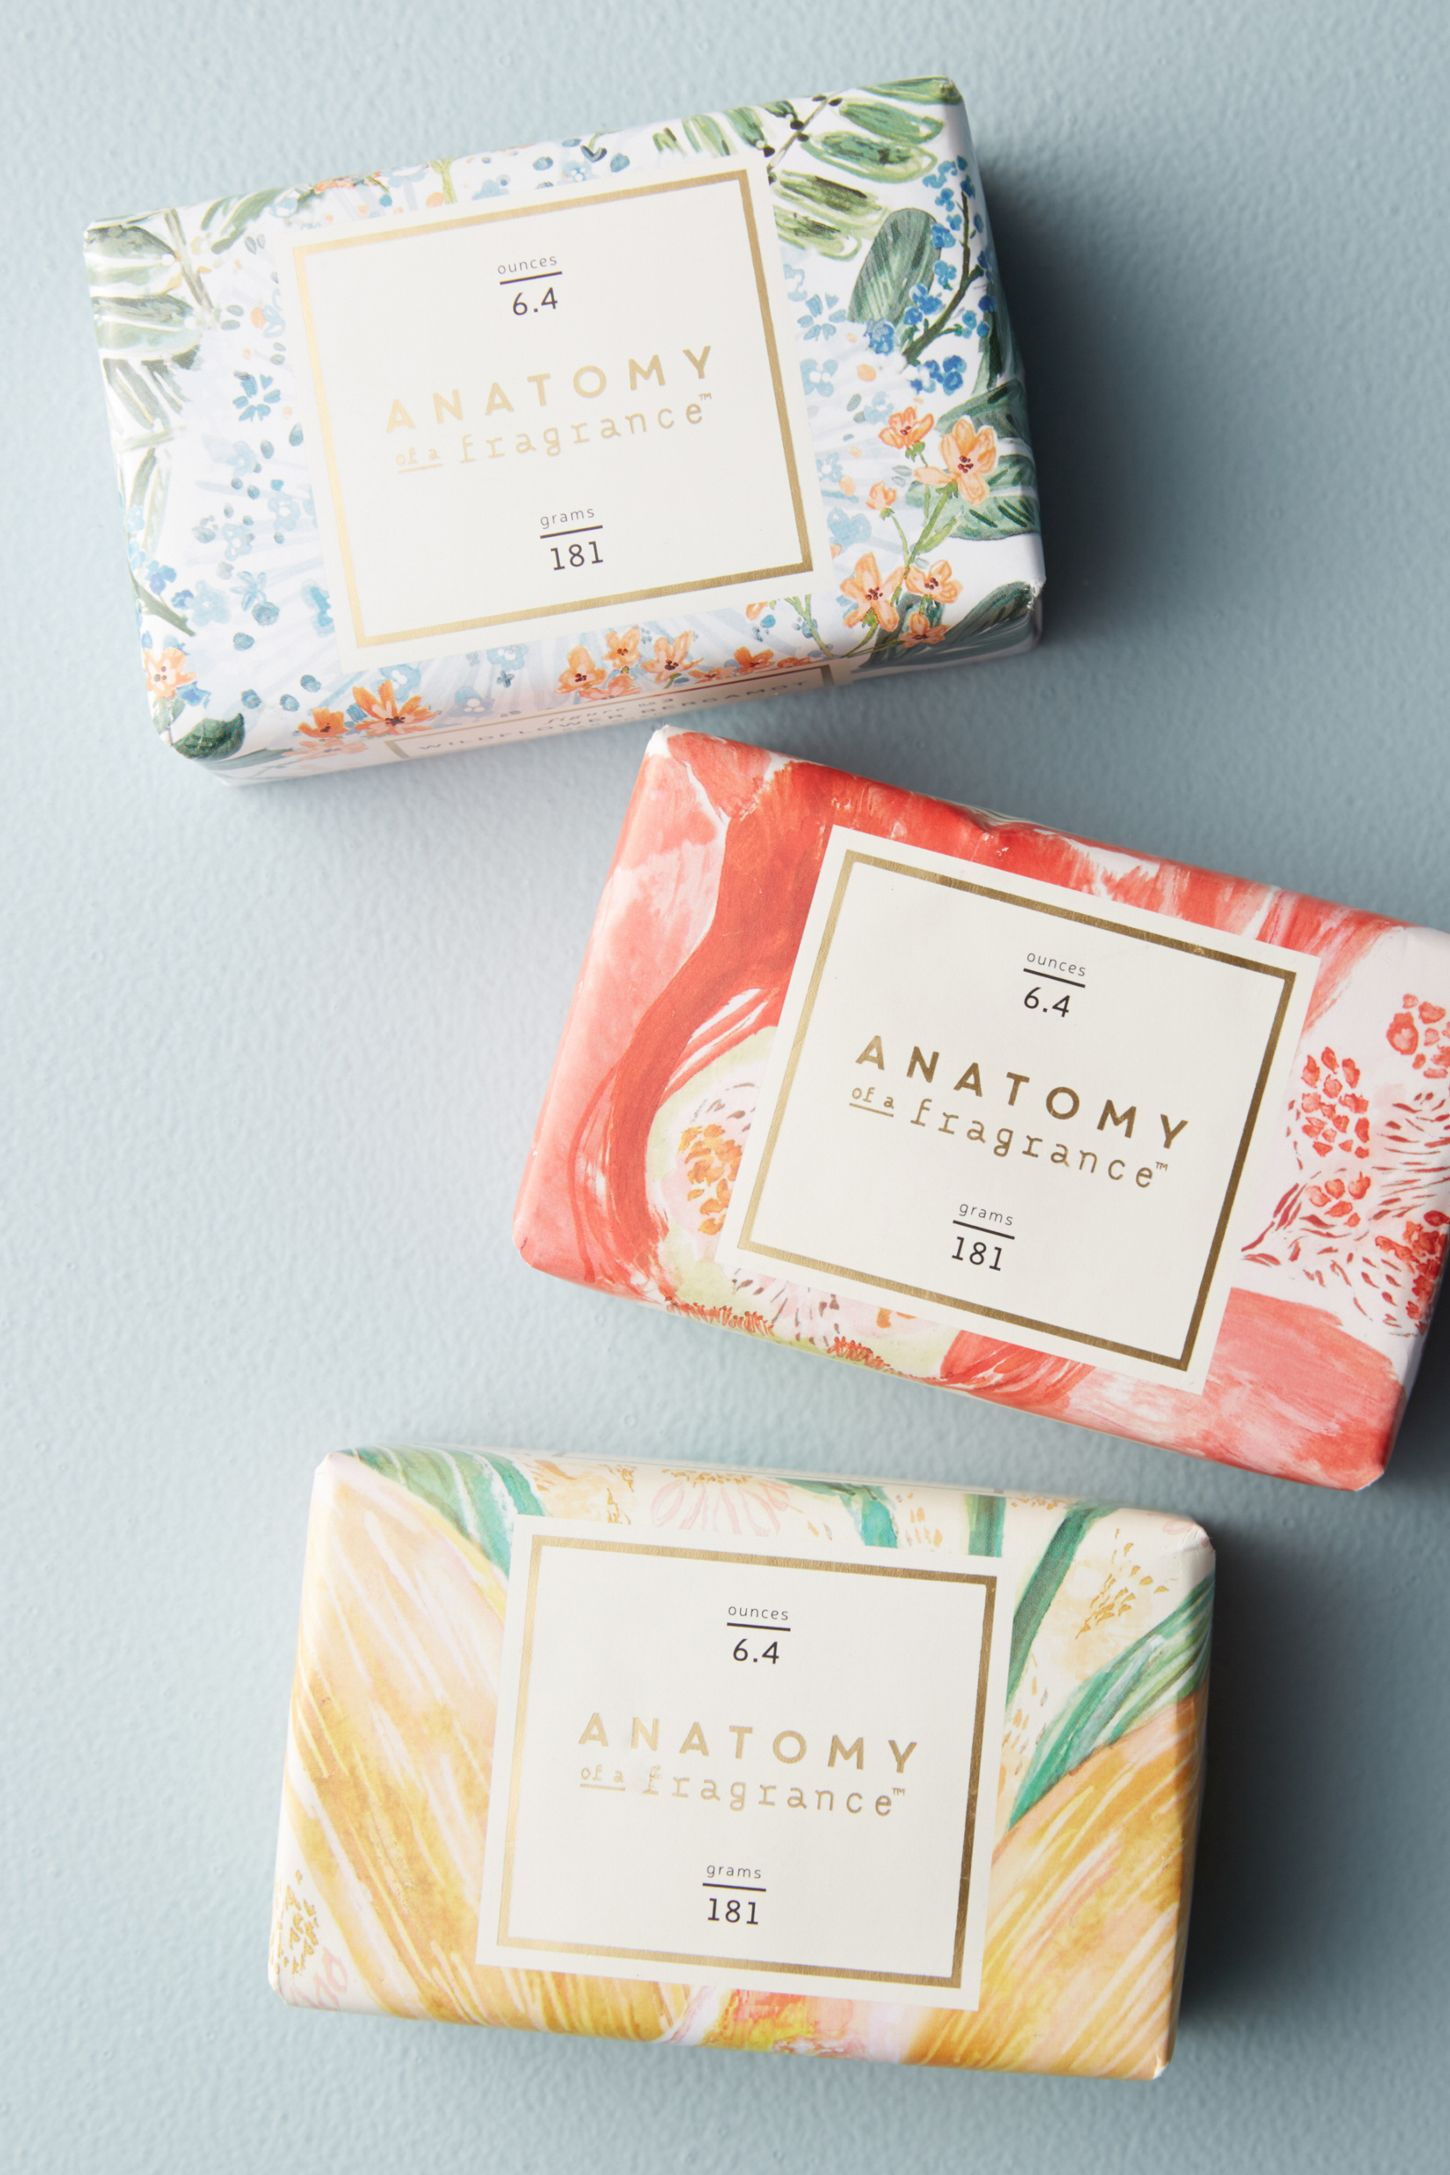 Anatomy Of A Fragrance Bar Soap | Anthropologie